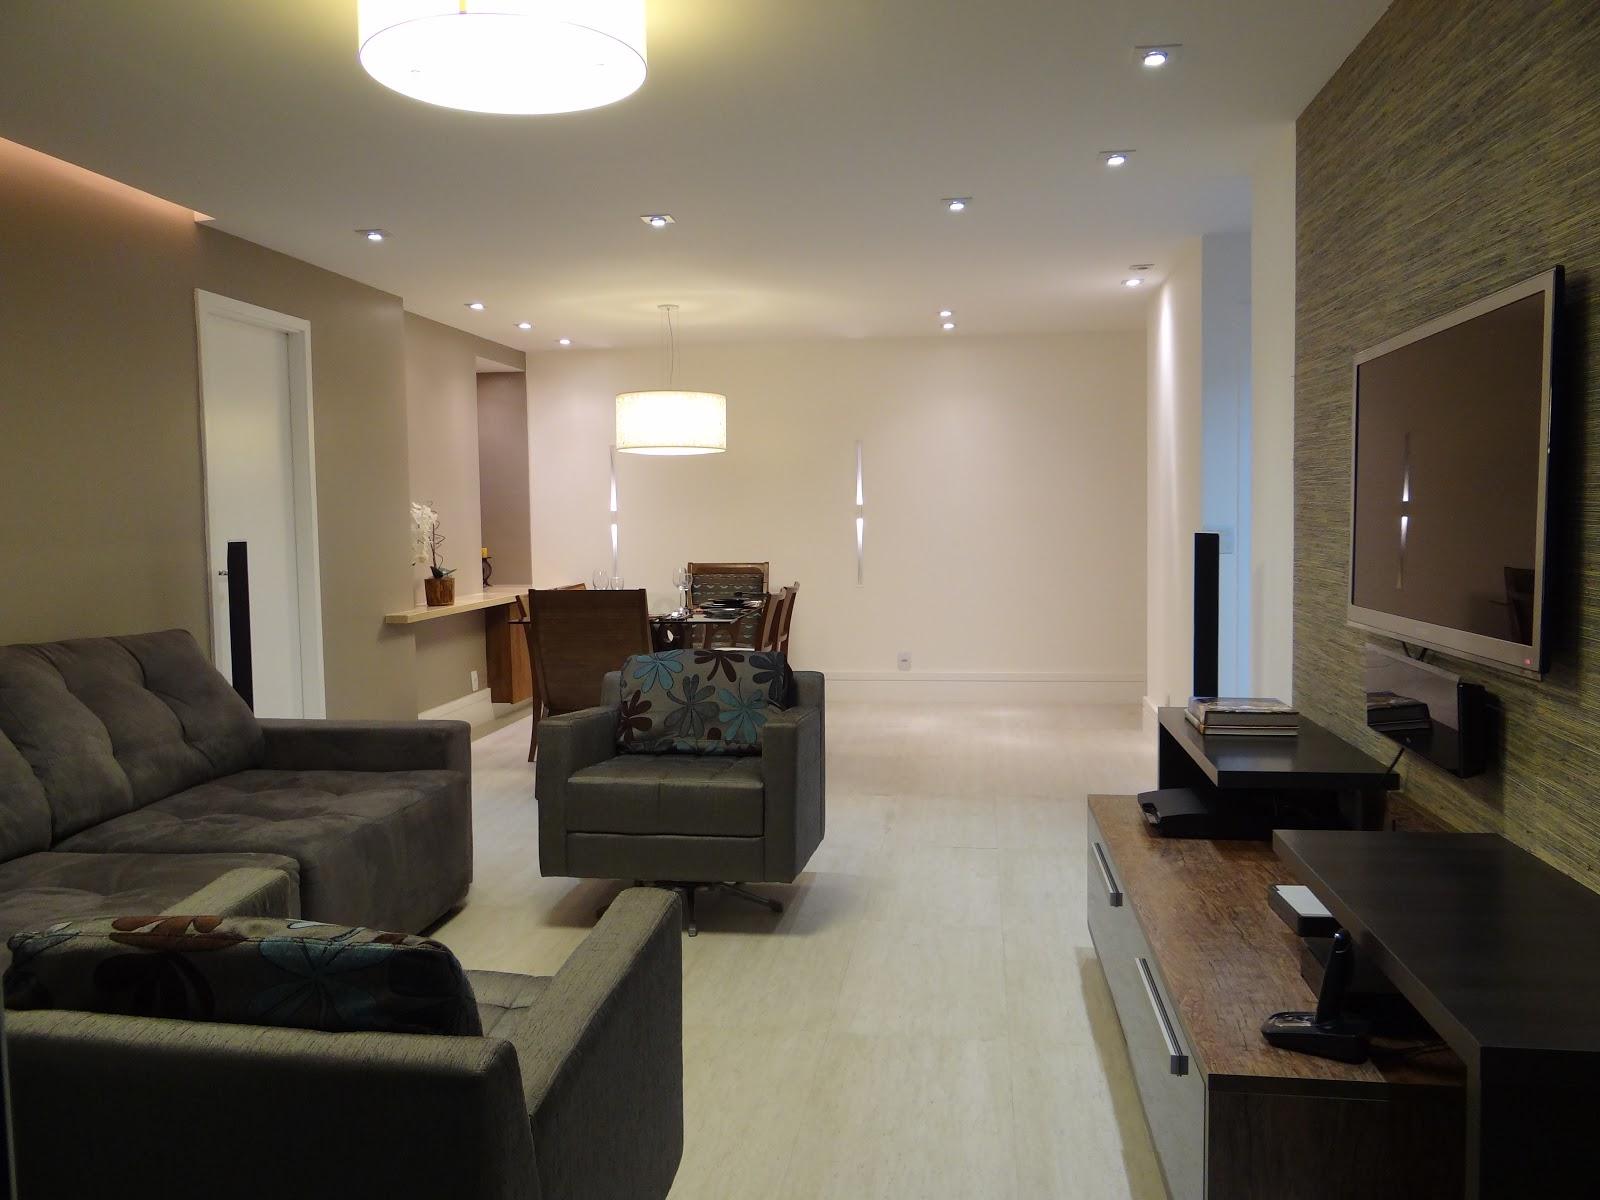 http://2.bp.blogspot.com/ ReginaSegura. arquitetura: REFORMA  #456686 1600x1200